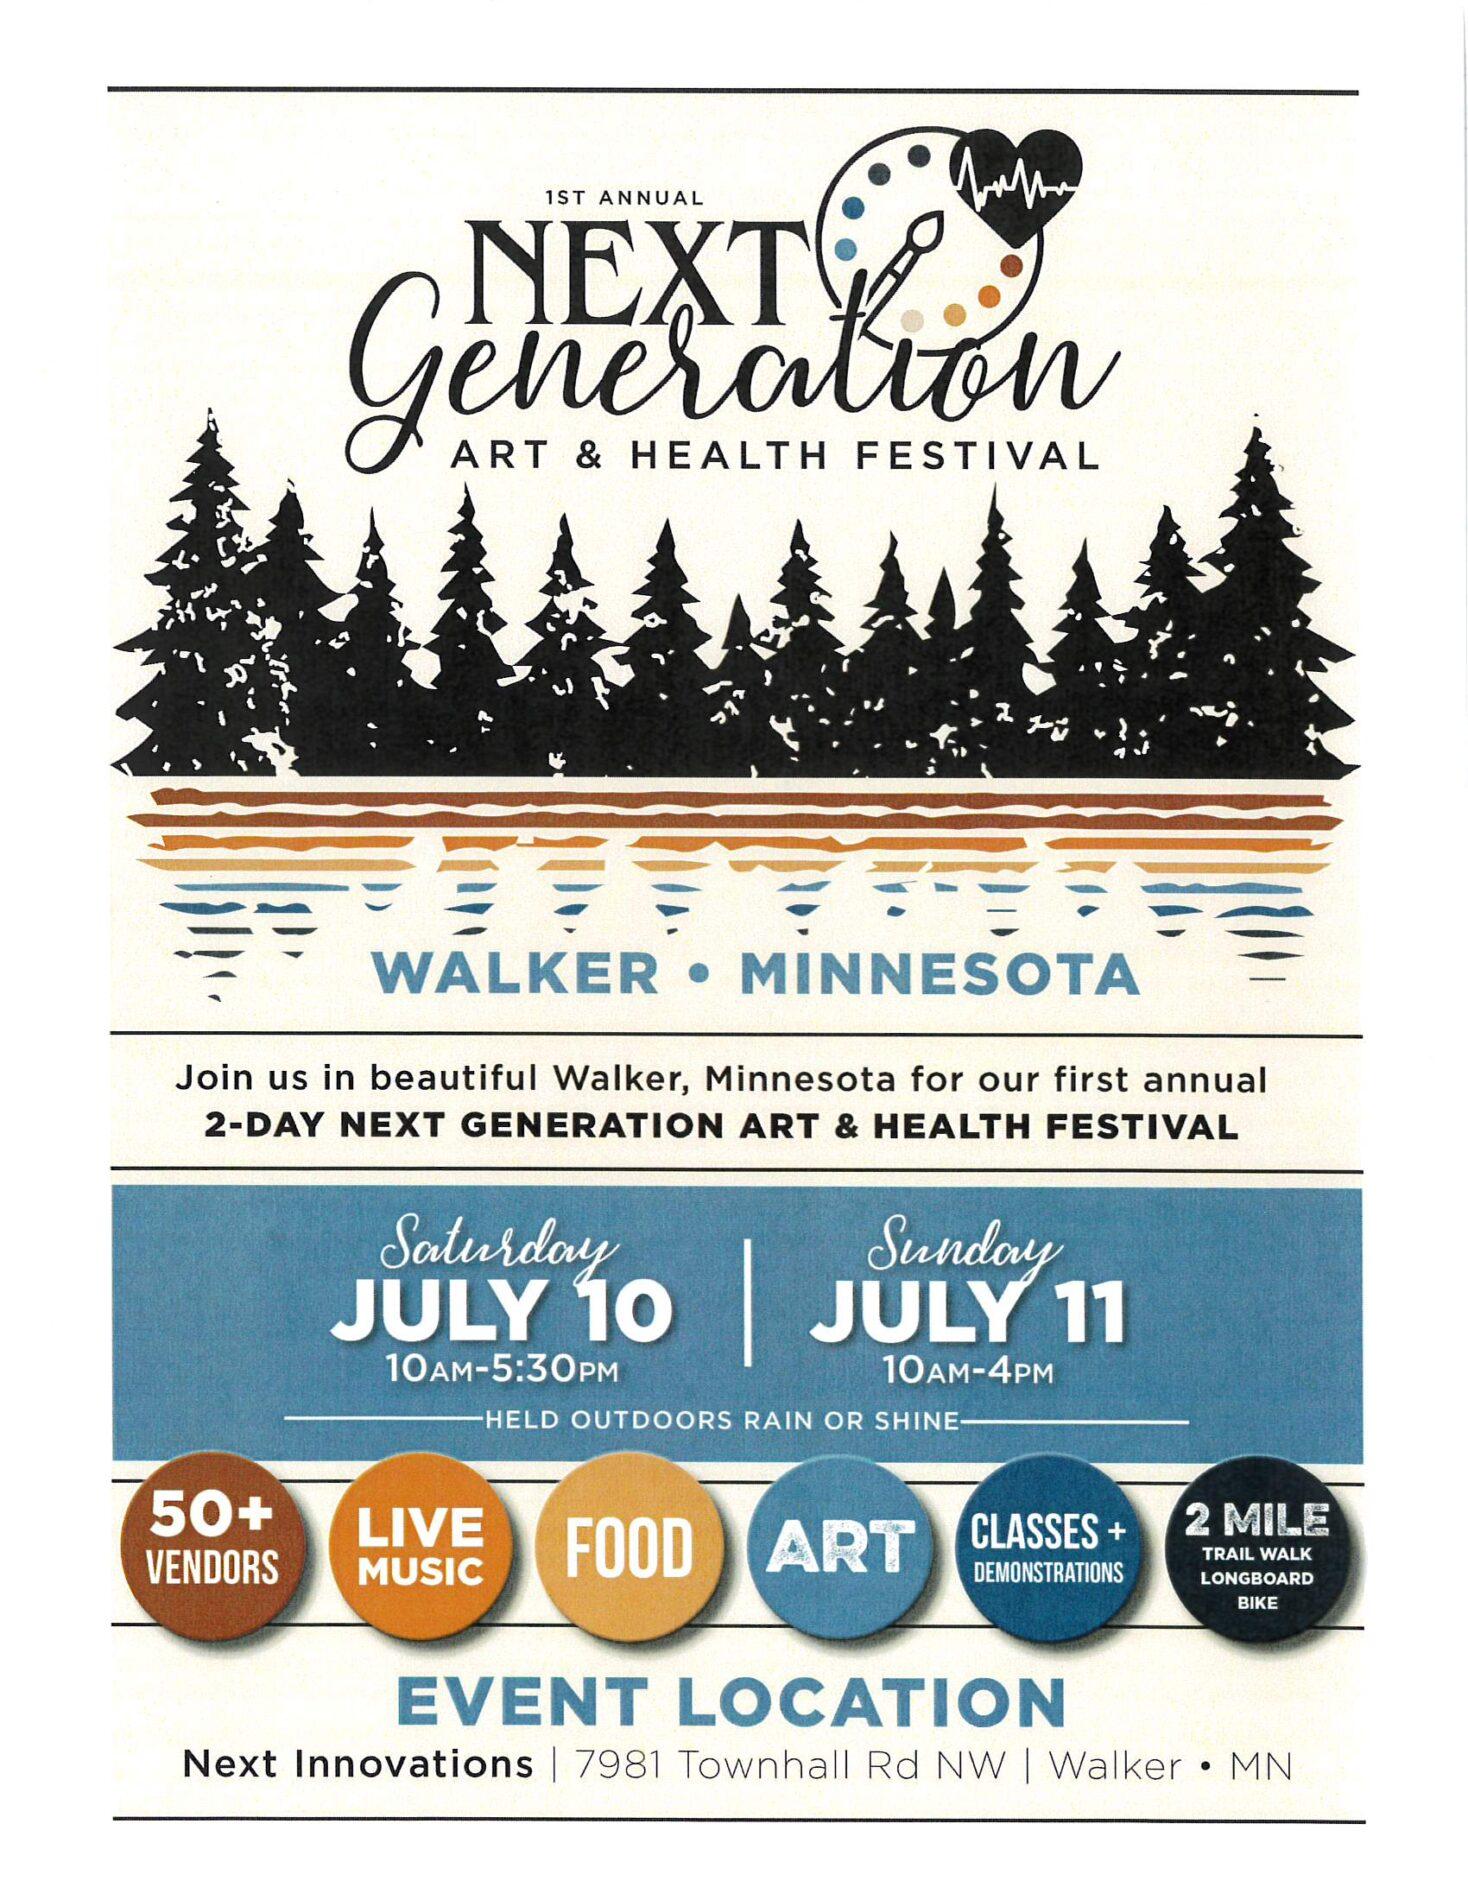 Next Generation Art and Health Festival